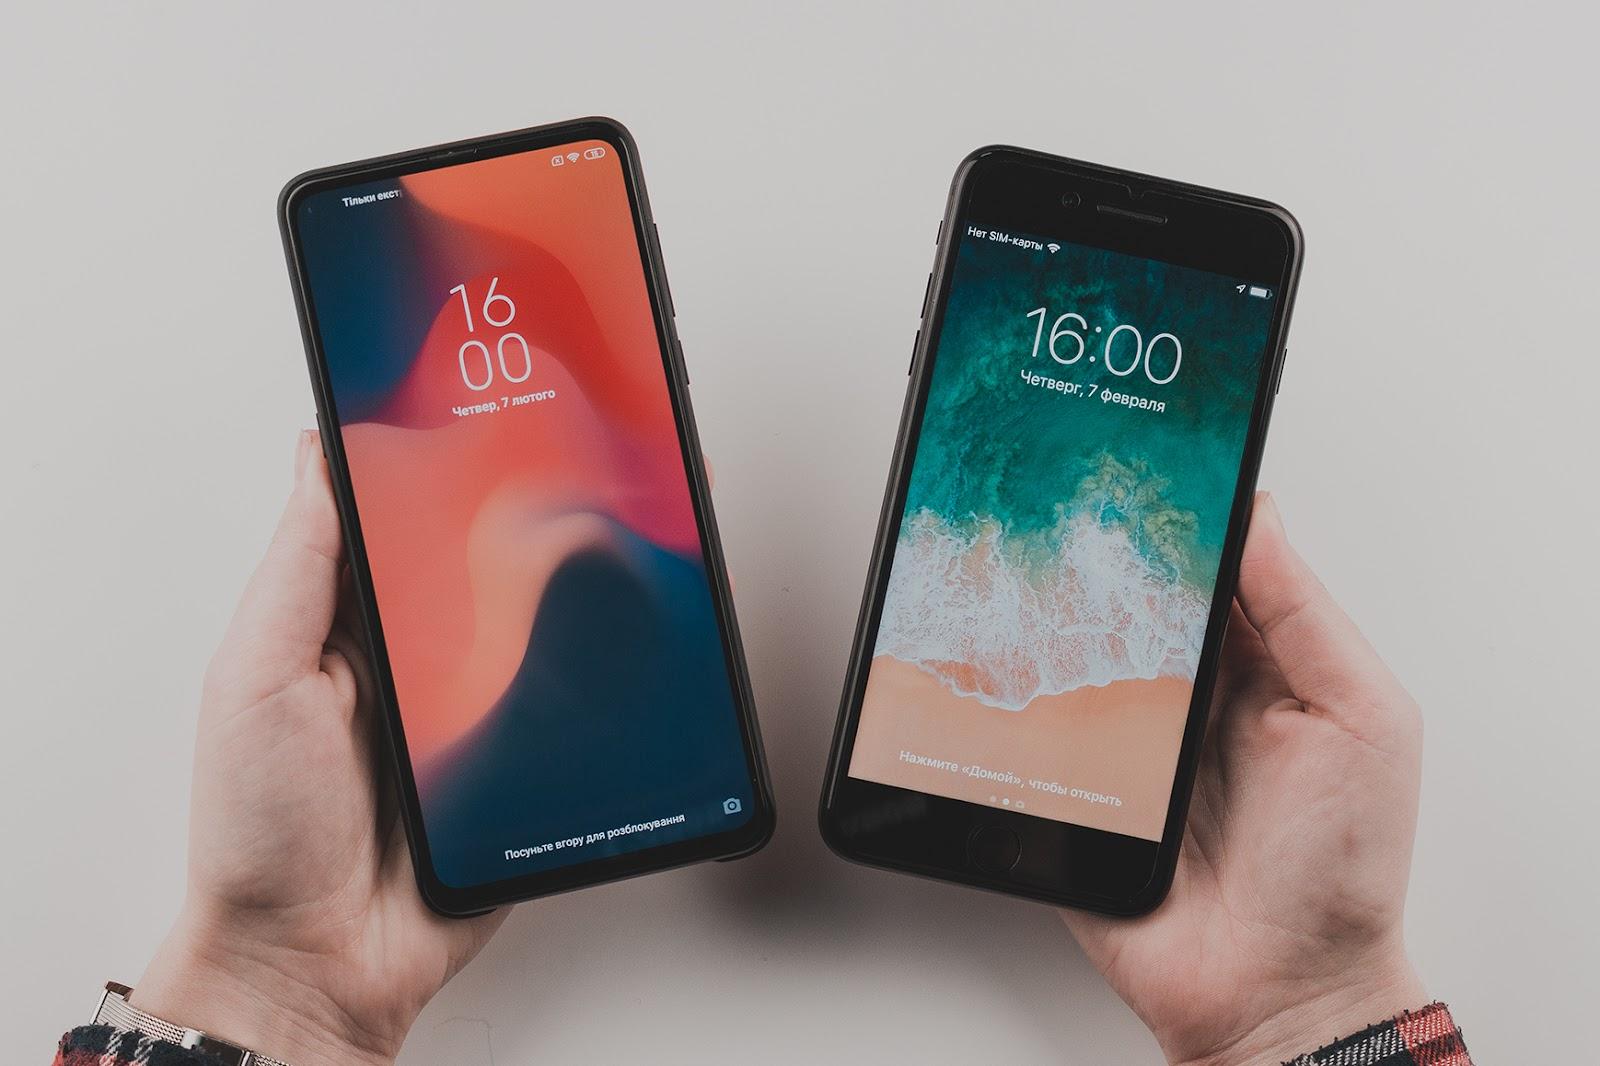 iphone 7 plus VS Xiaomi Mi Mix 3